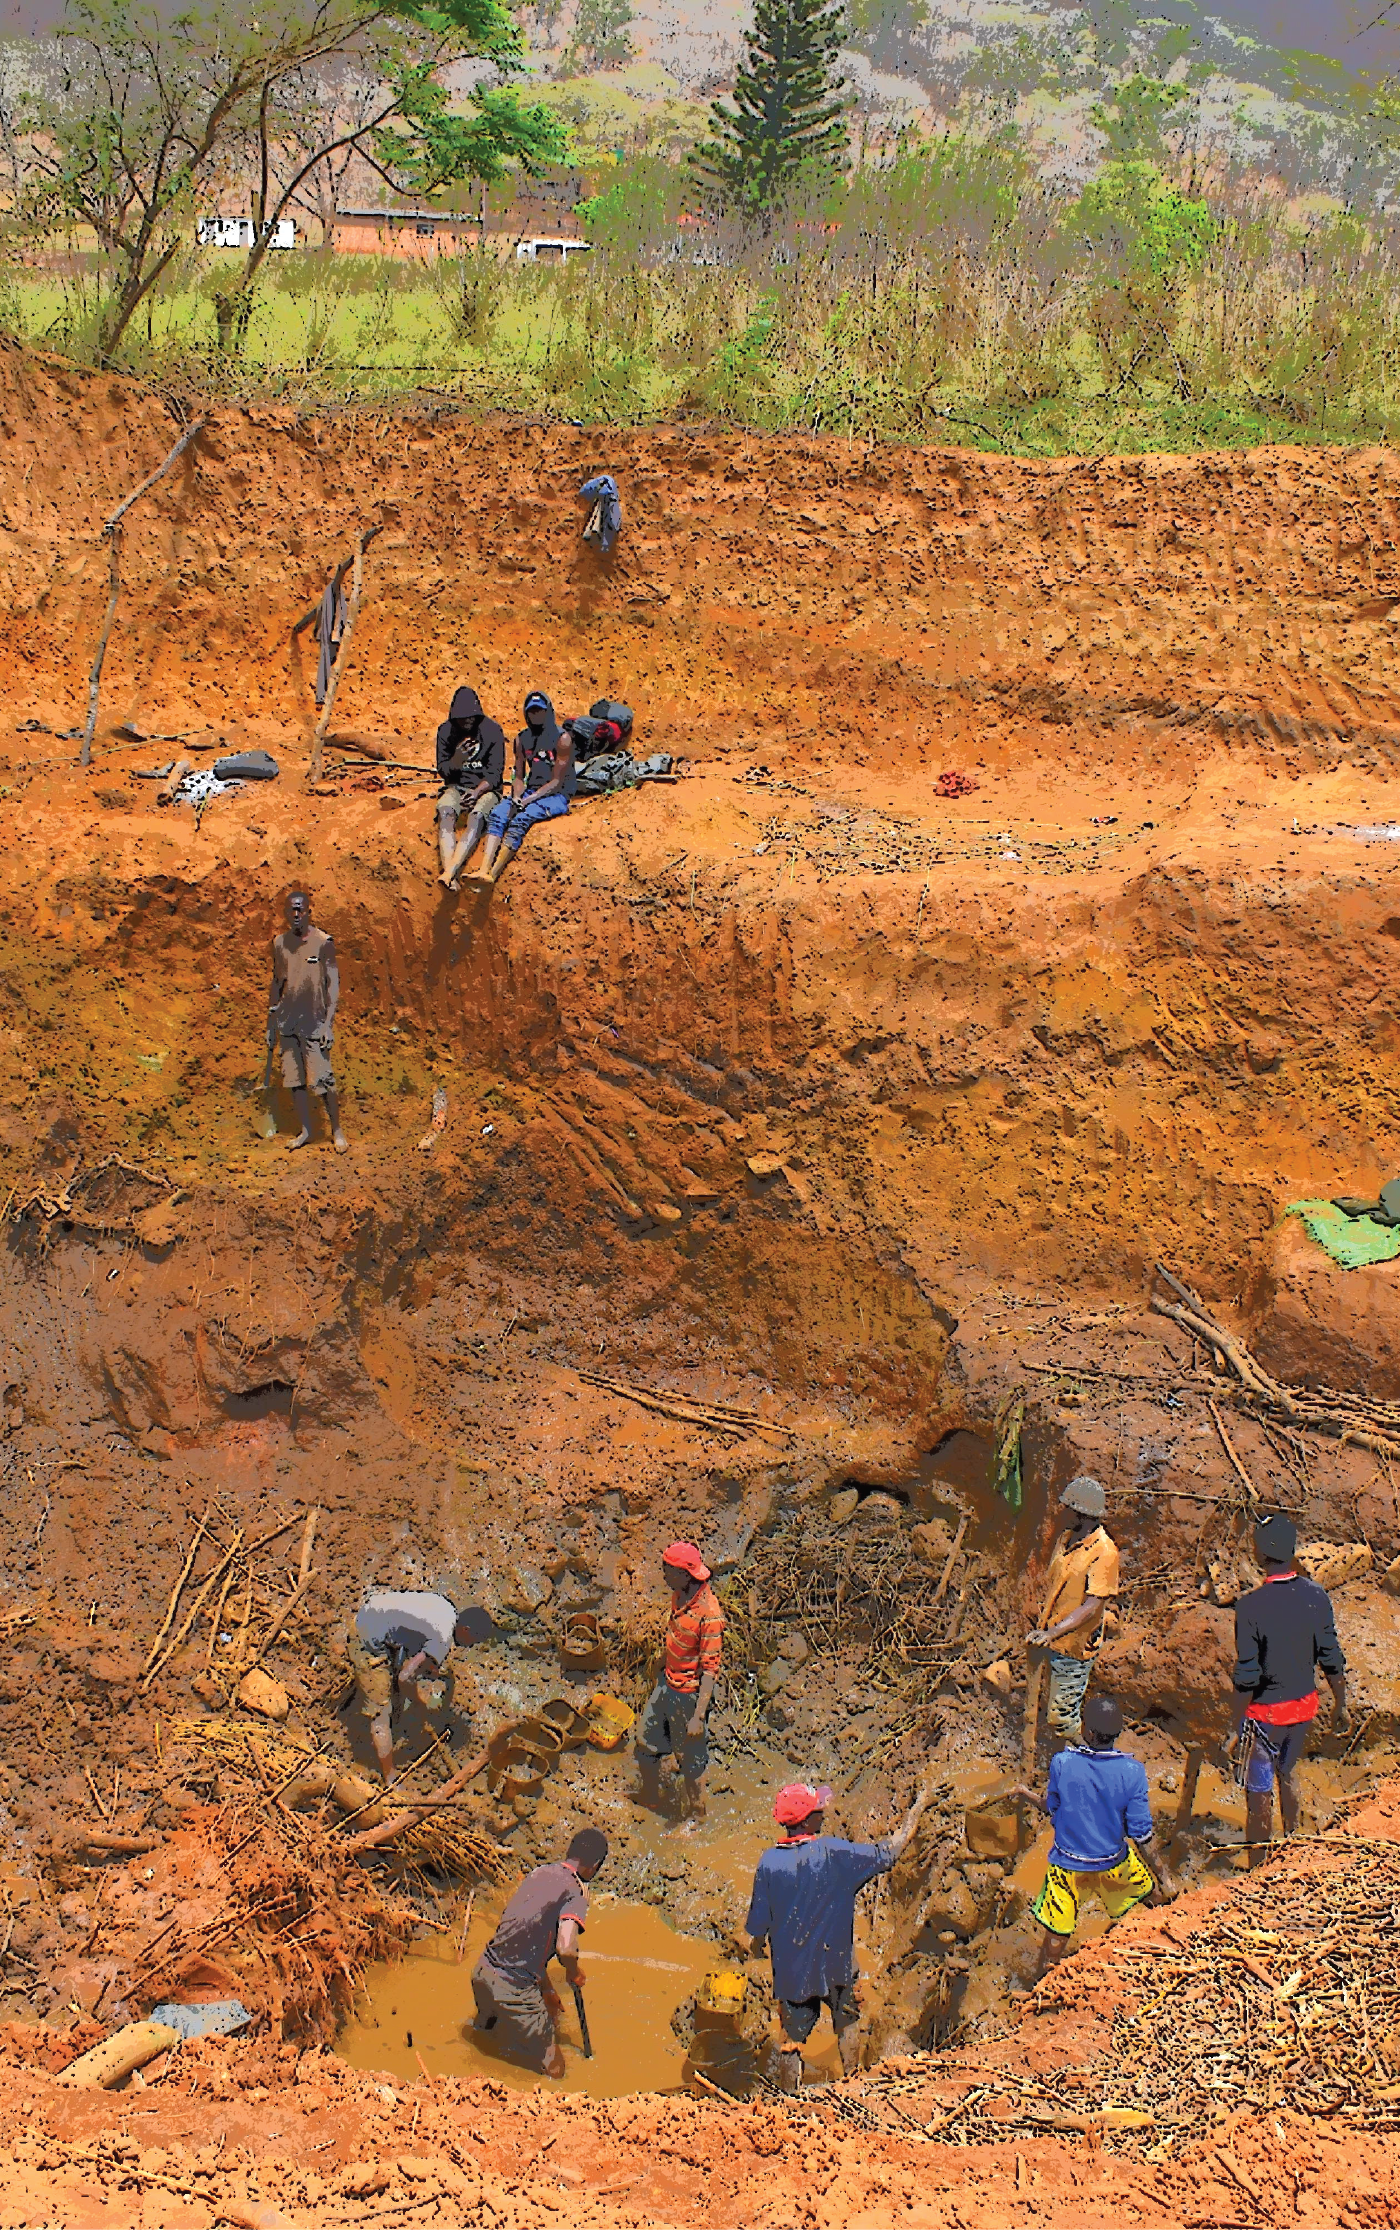 artisanal mining miners criminalisation